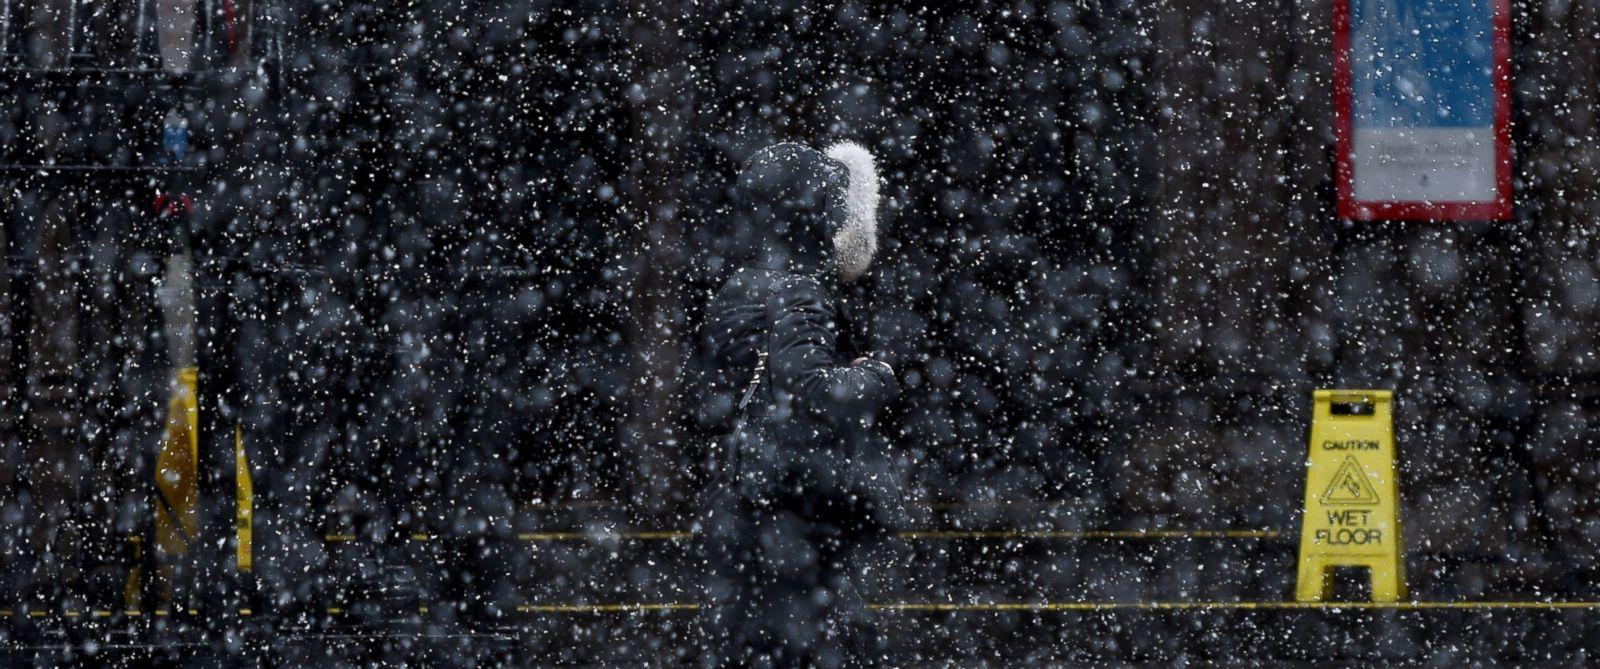 gty-snow-er-170313_12x5_1600_1489429662825.jpg